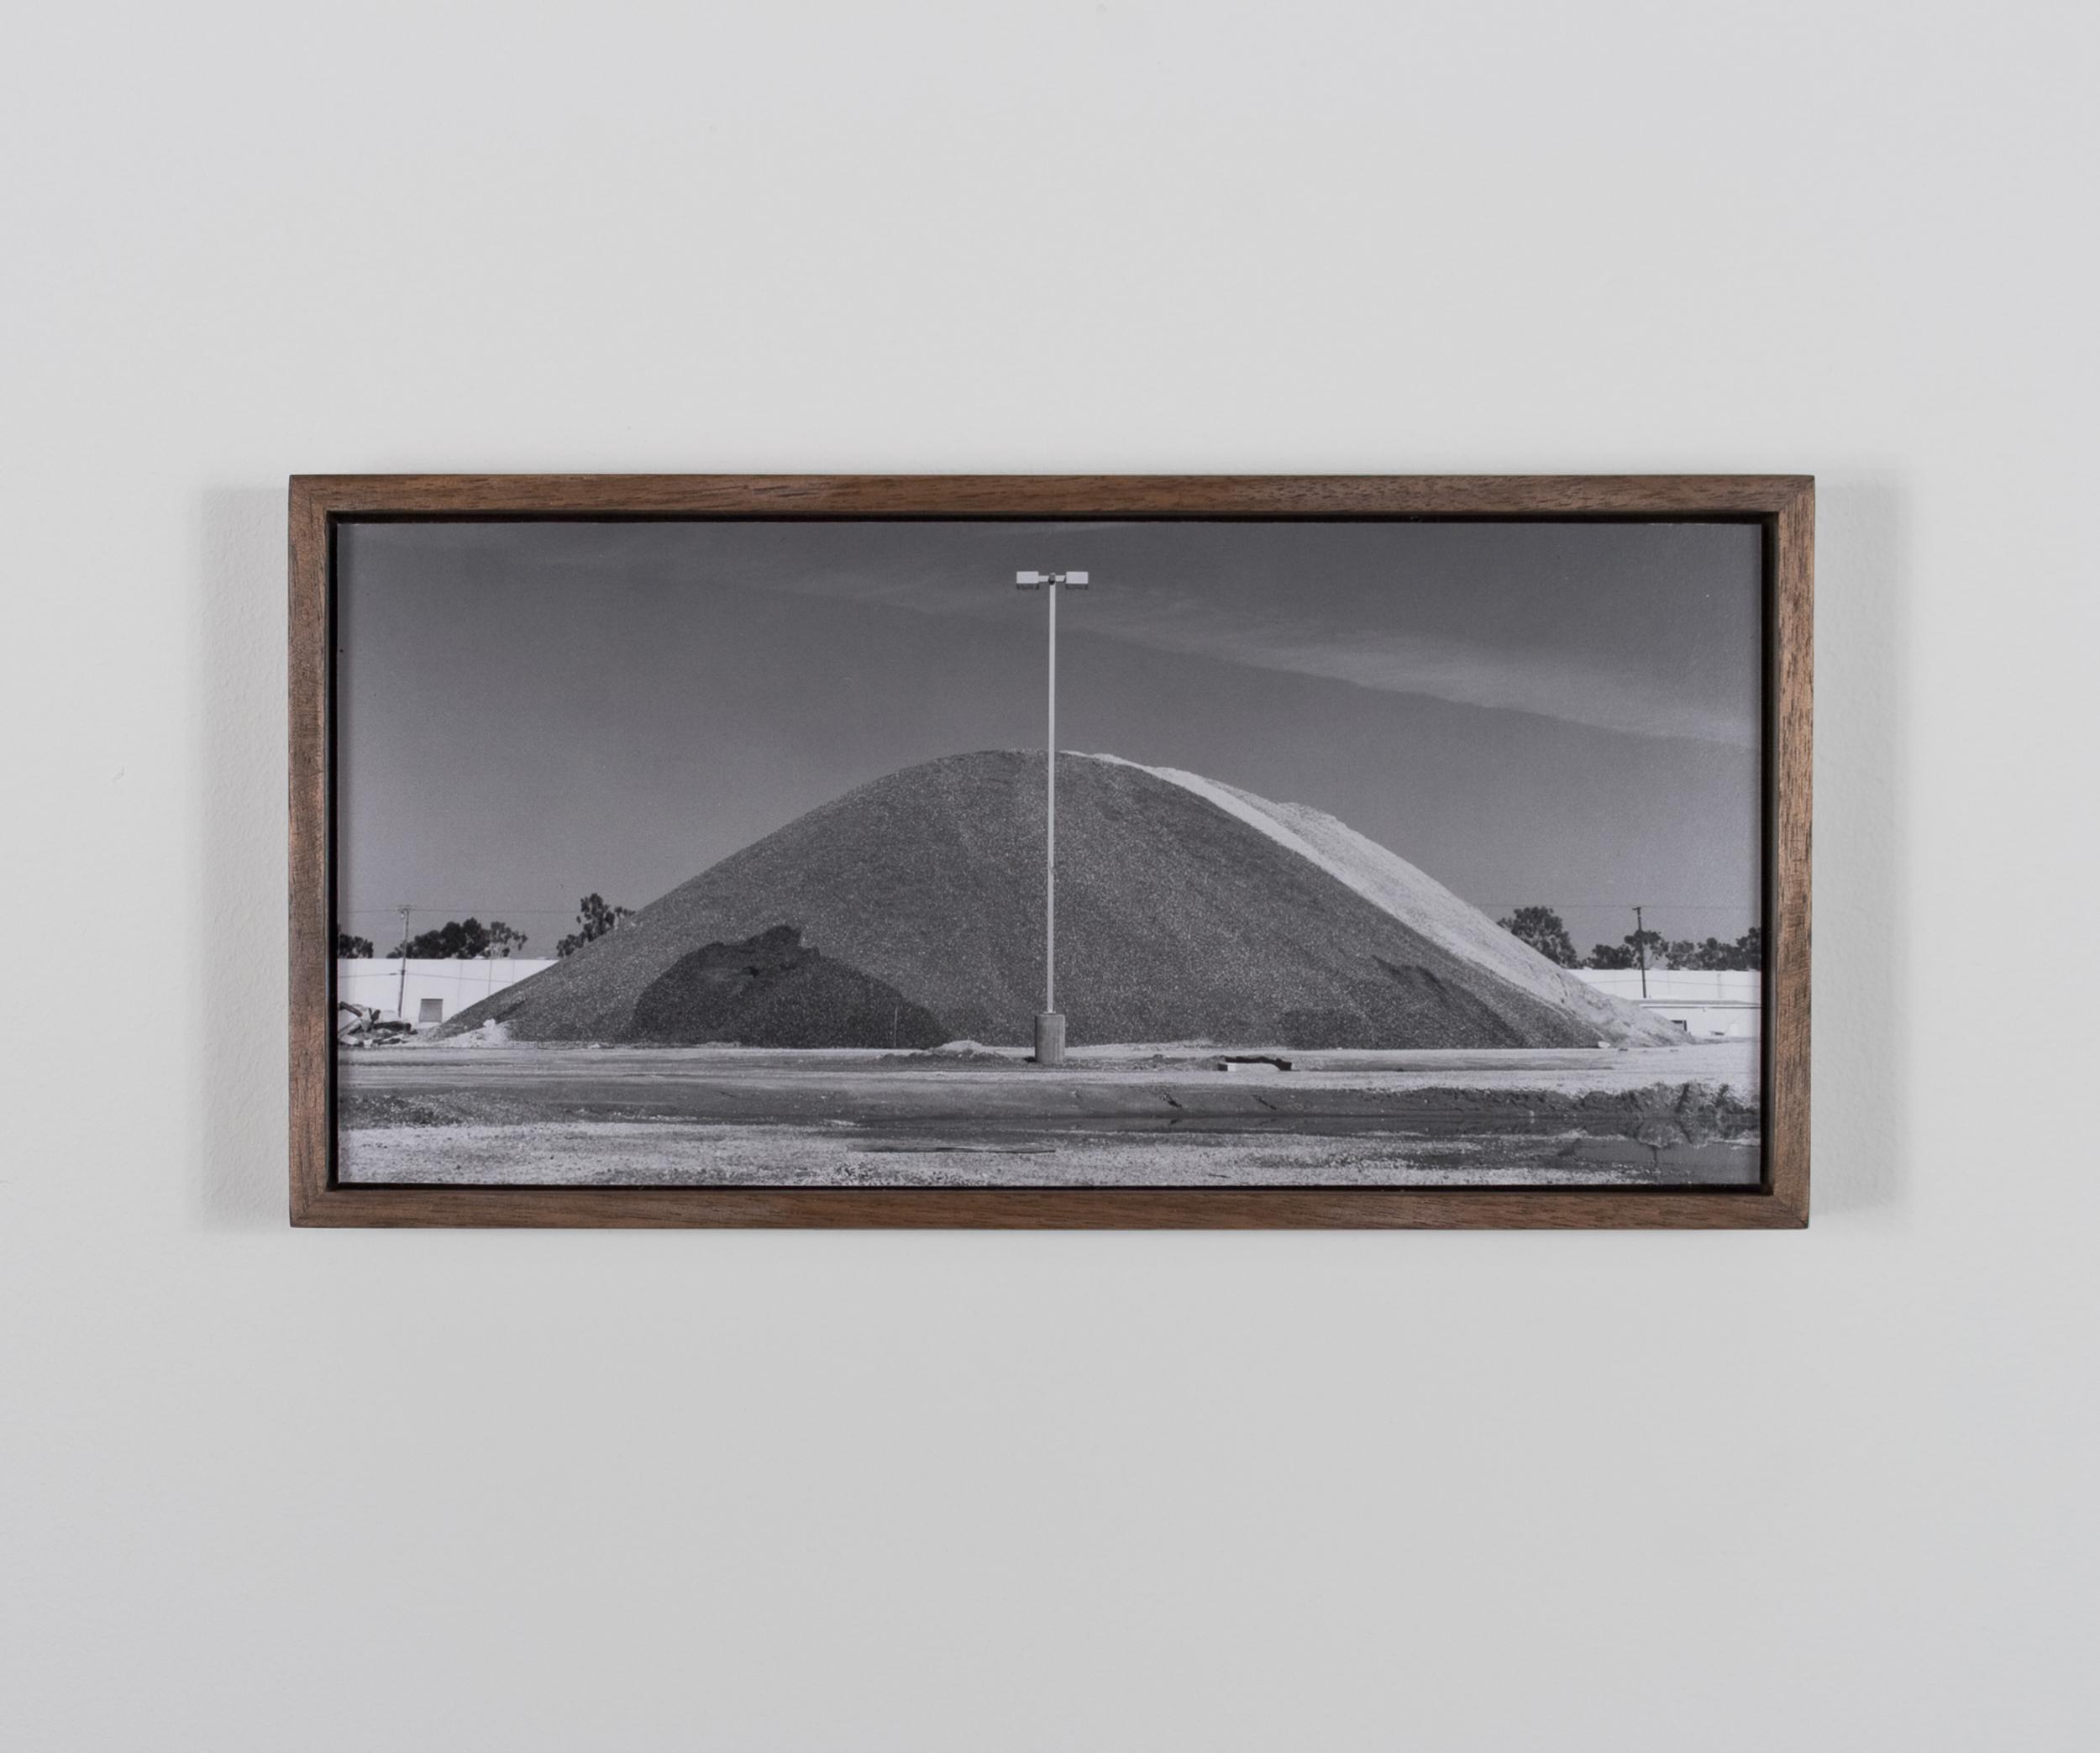 Mount Helion 2009/10 Gelatin-silver print on Dibond, with walnut frame